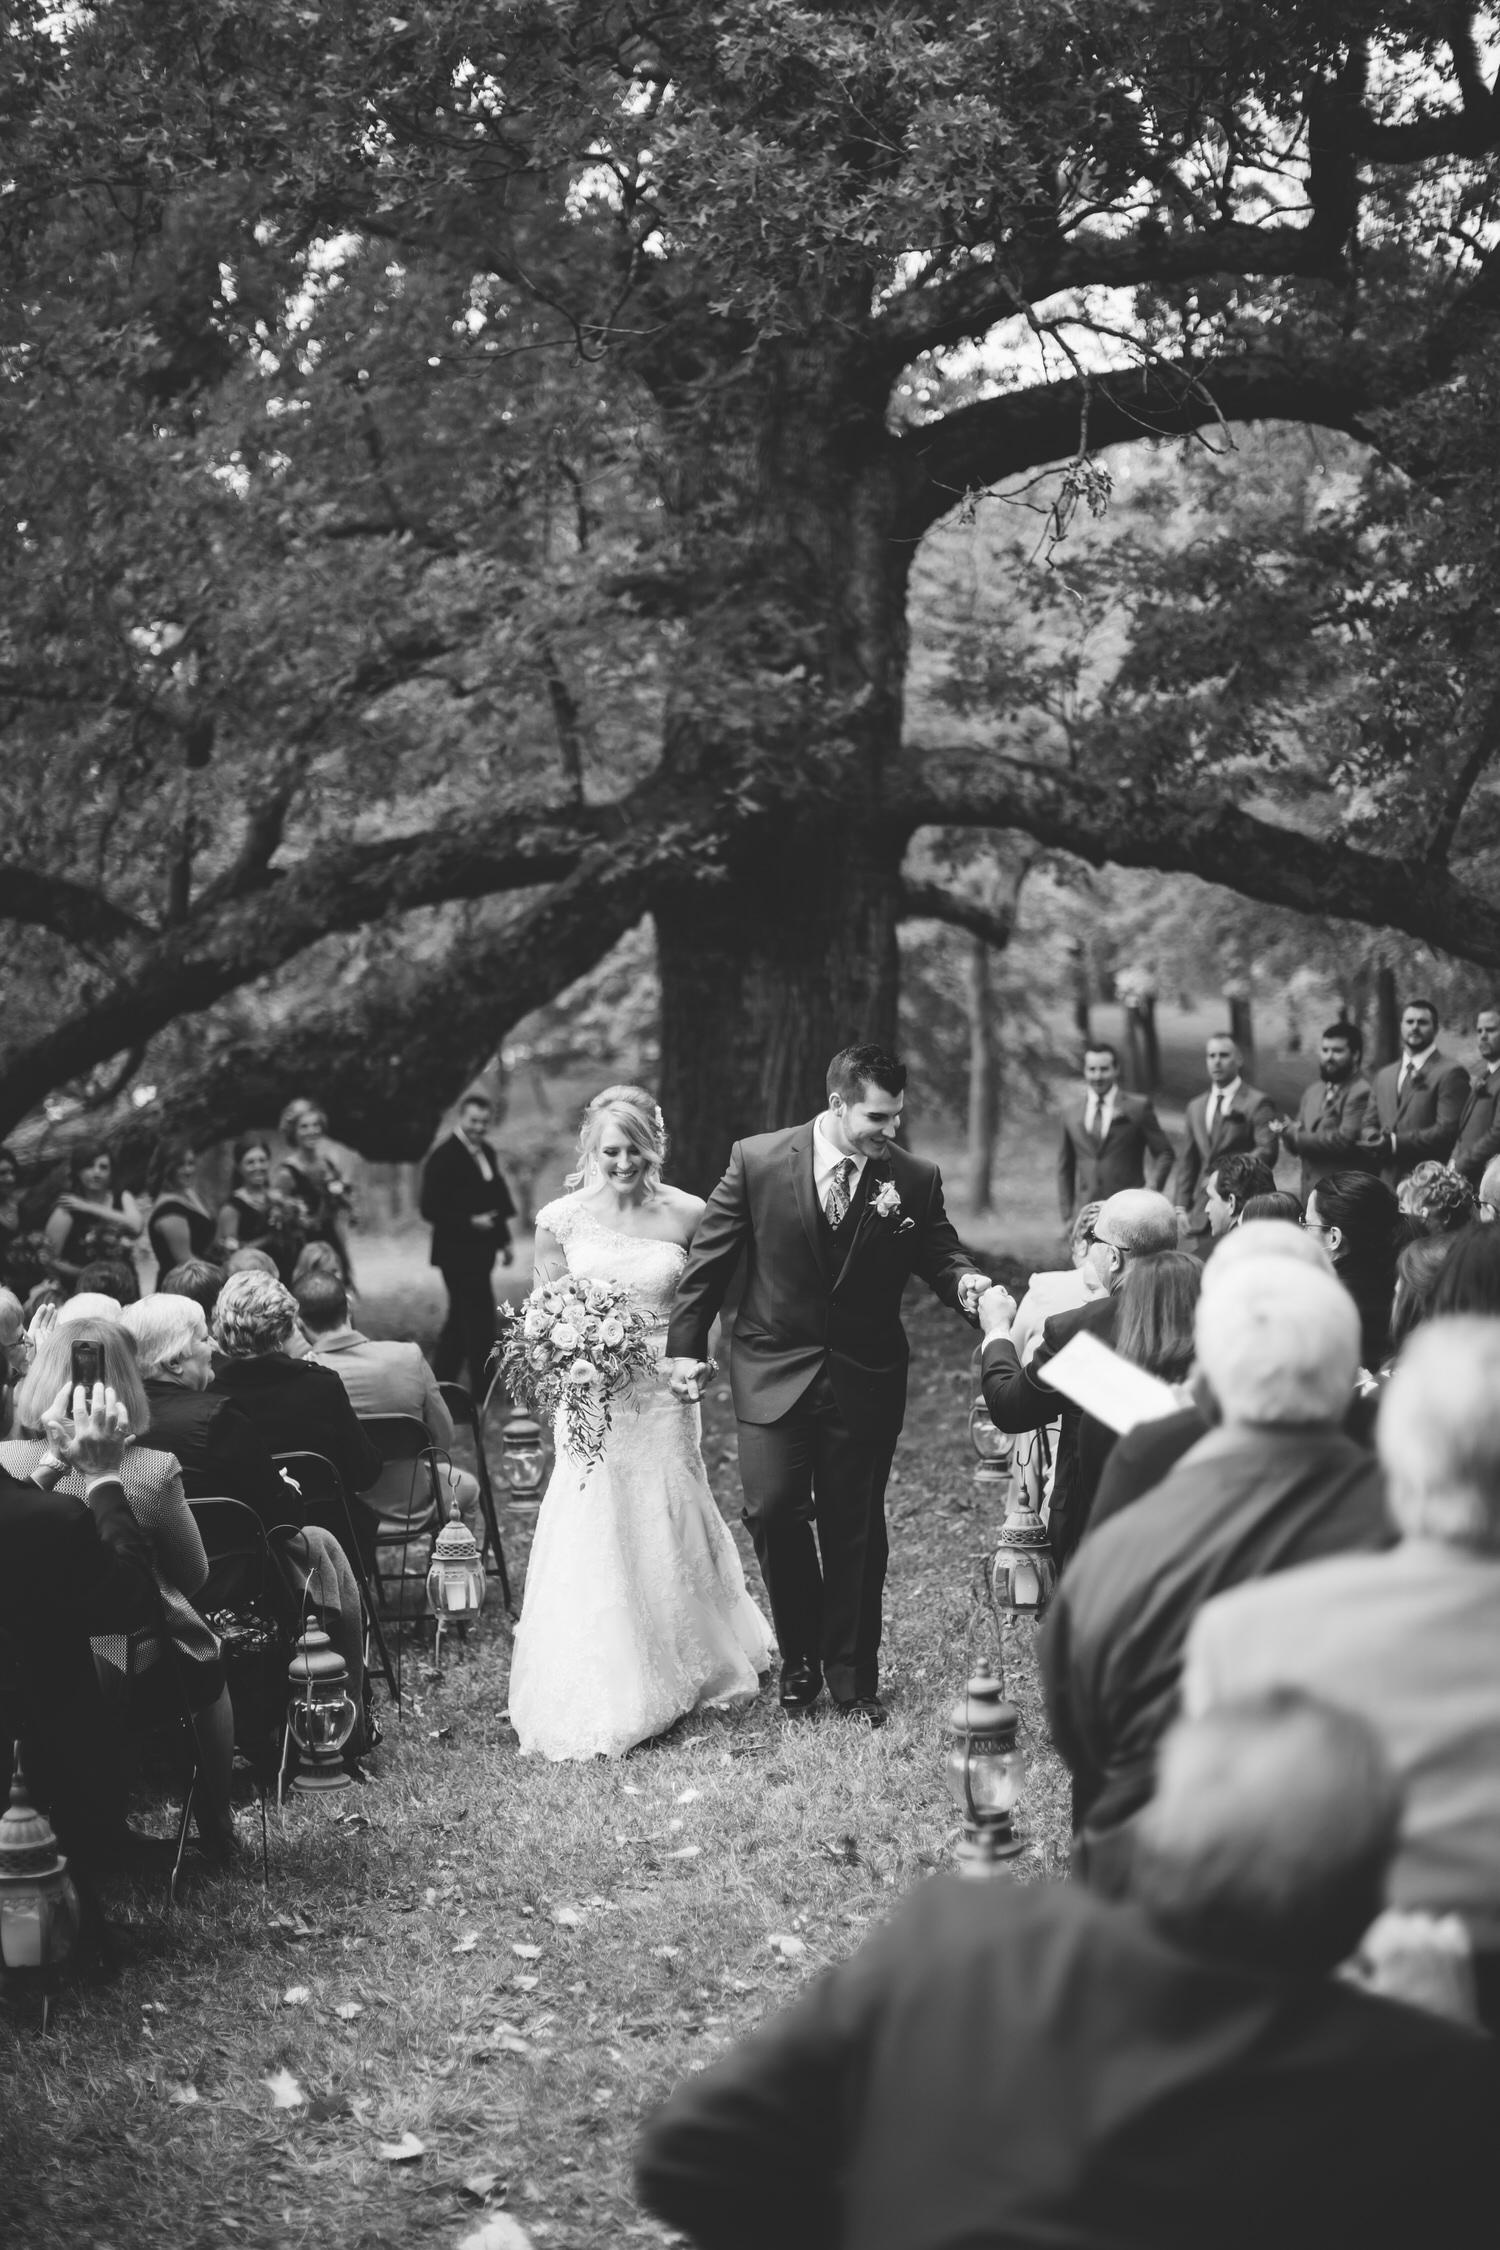 Outdoor wedding, bride and groom walking down aisle, Illinois Wedding Photographer